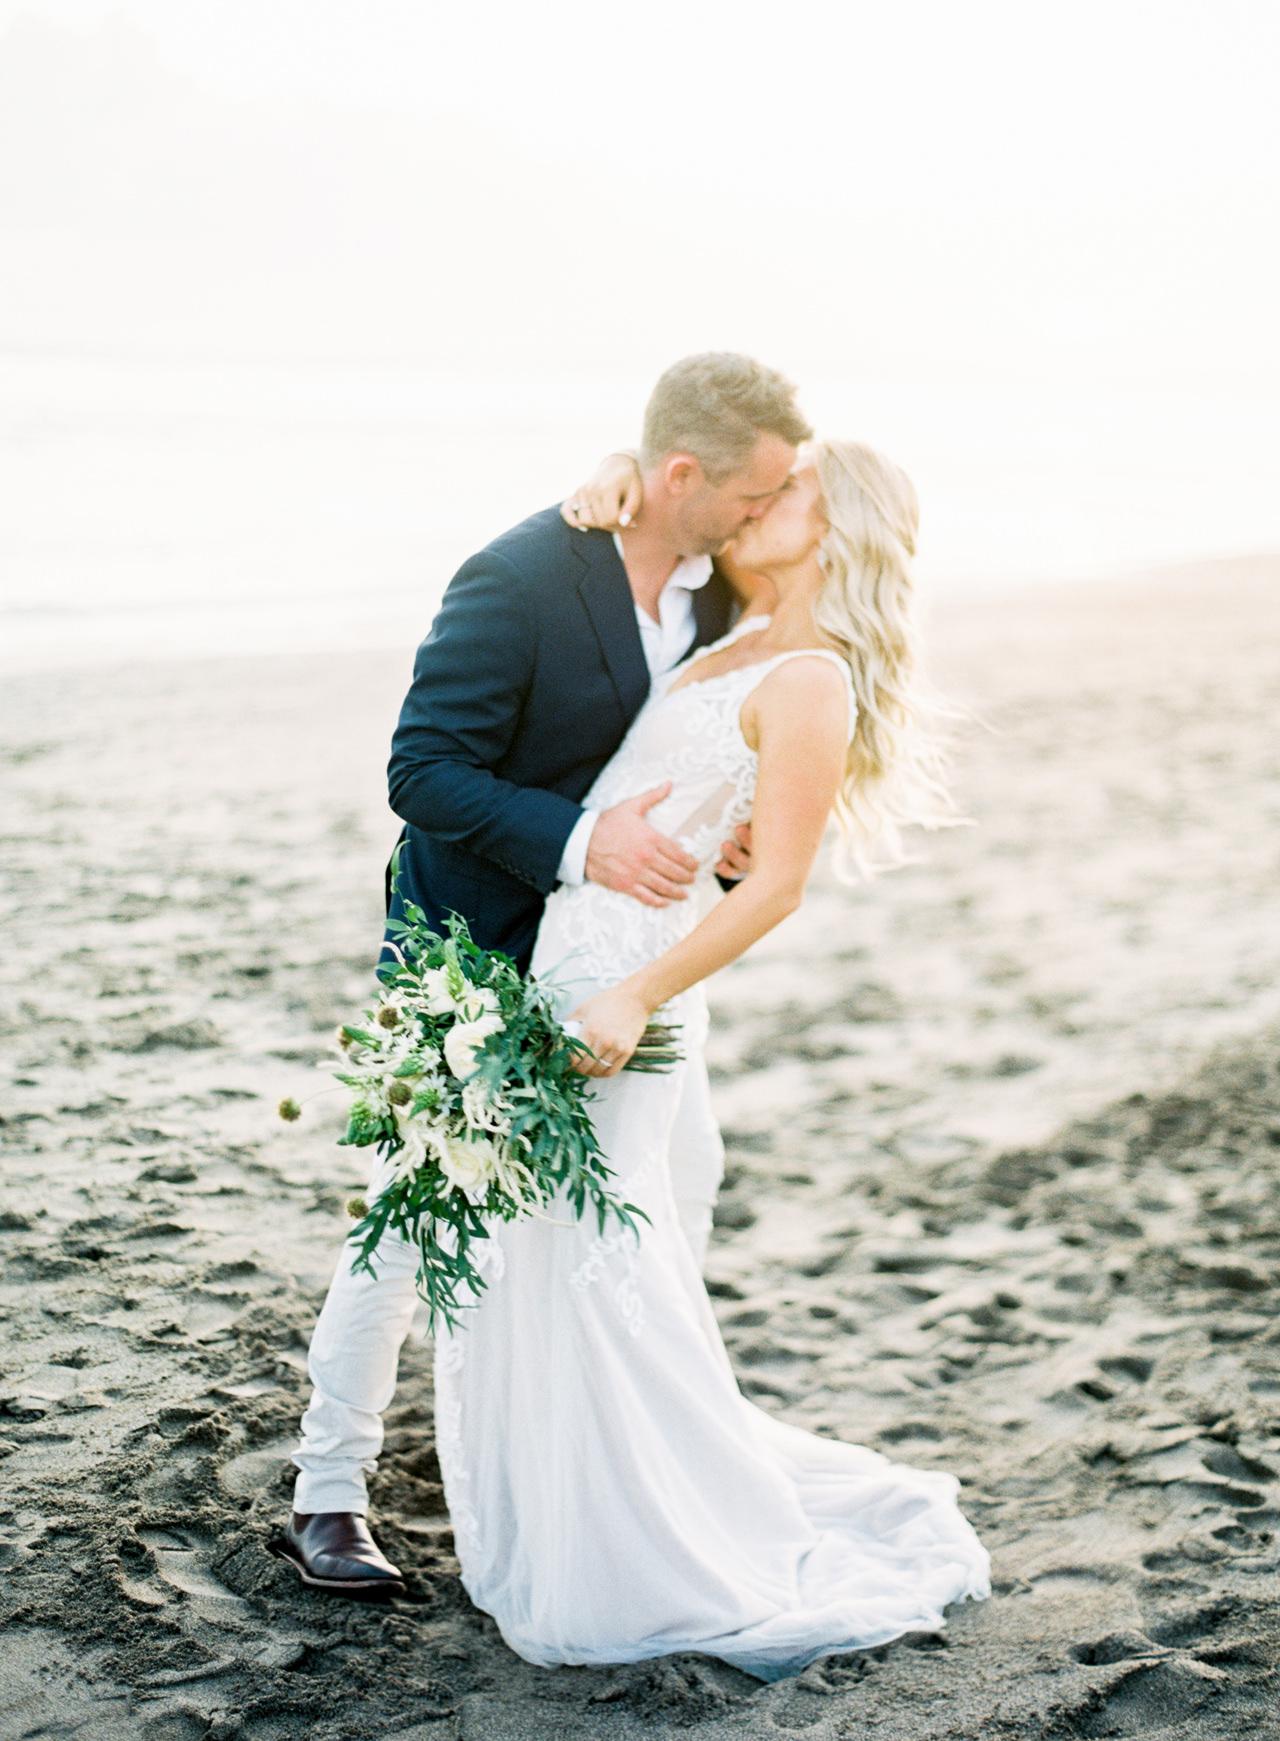 Bali Wedding Photographer | Canggu Wedding at Arnalaya Beach House 53